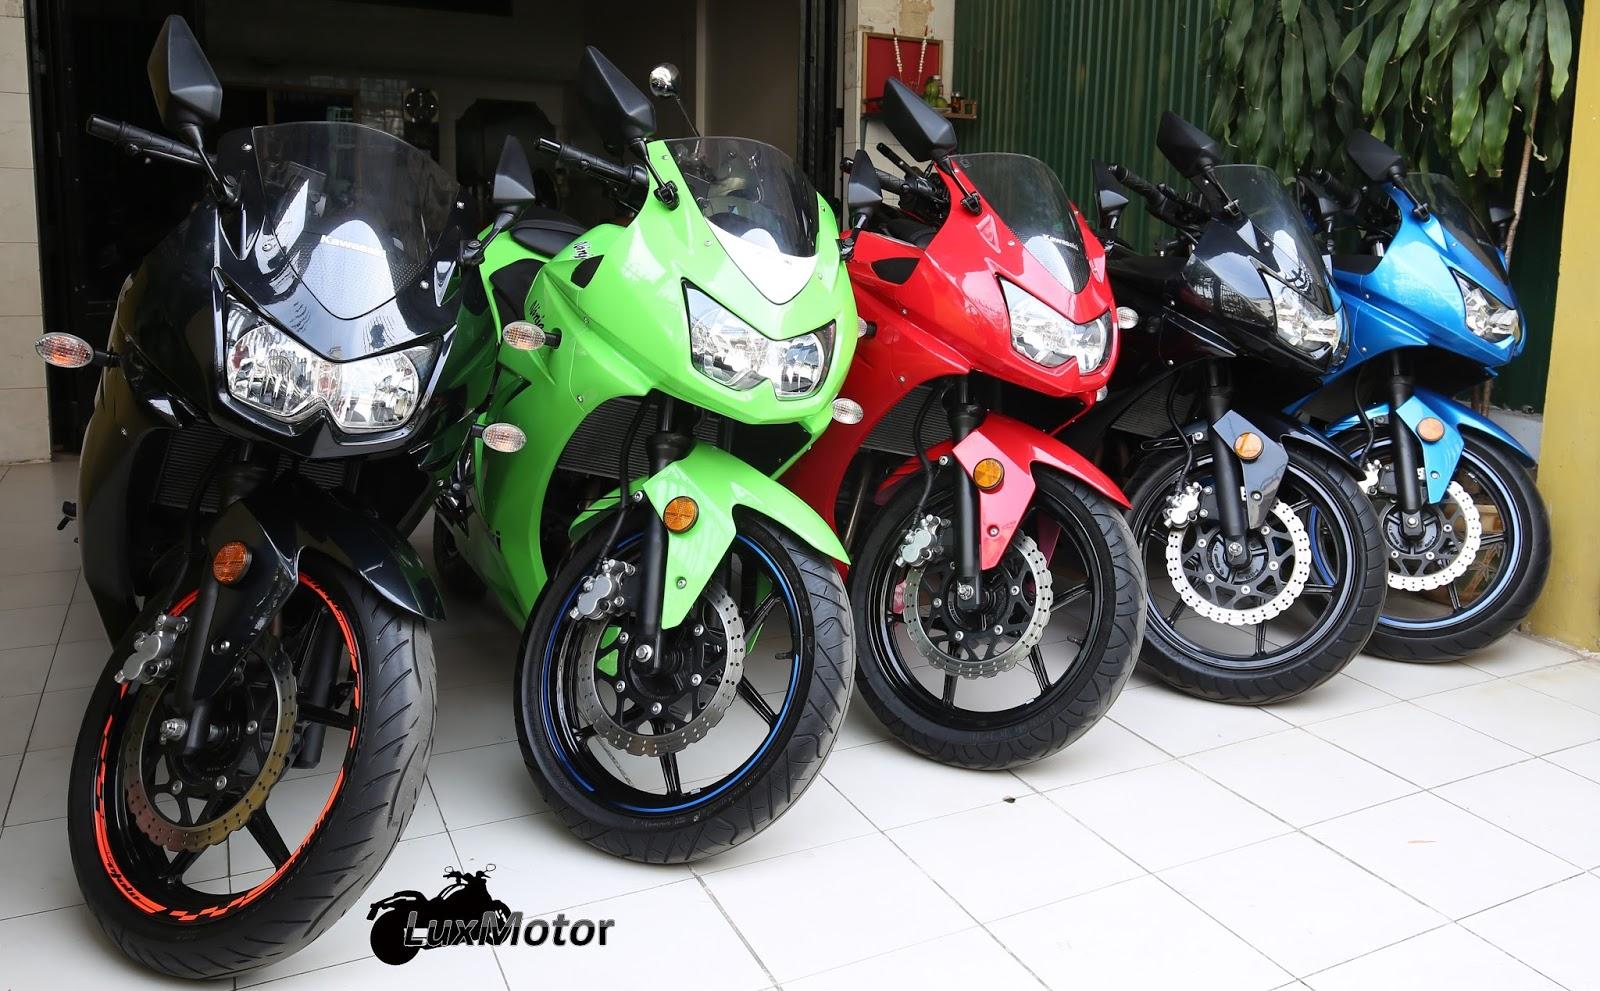 2009 To 2012 Kawasaki Ninja Ex250r Cambodia Expats Online Forum